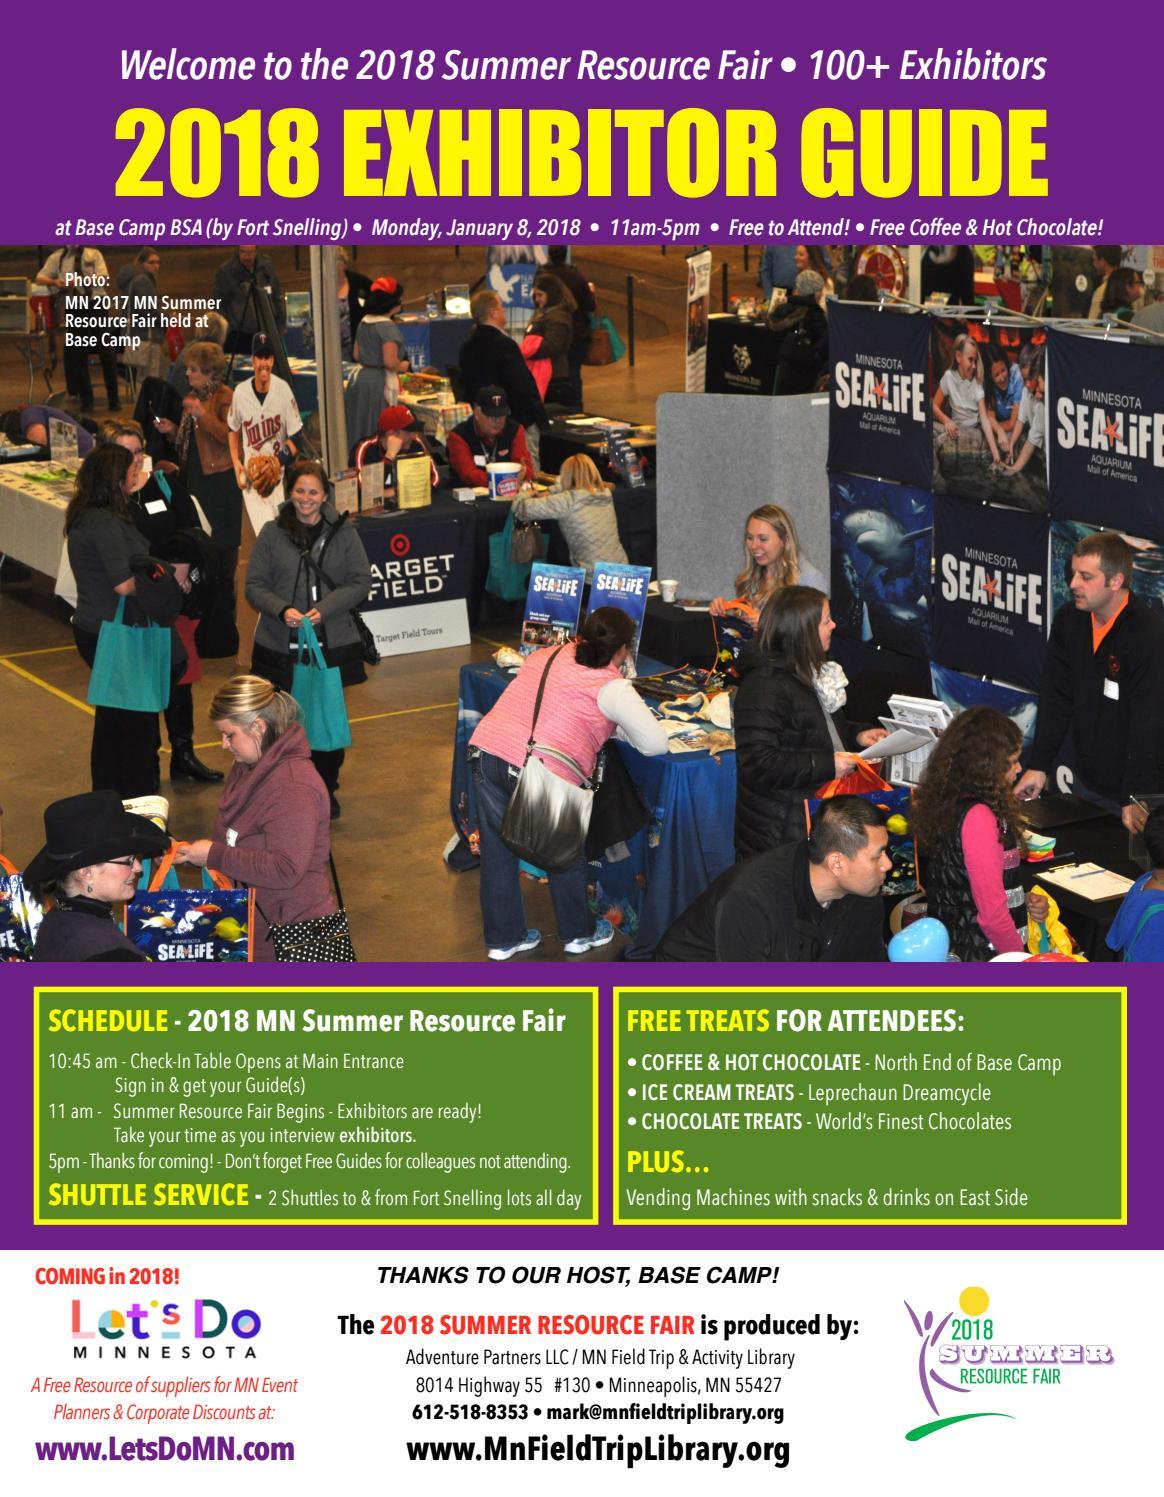 2018 srf brochure by Adventure Partners LLC - Issuu